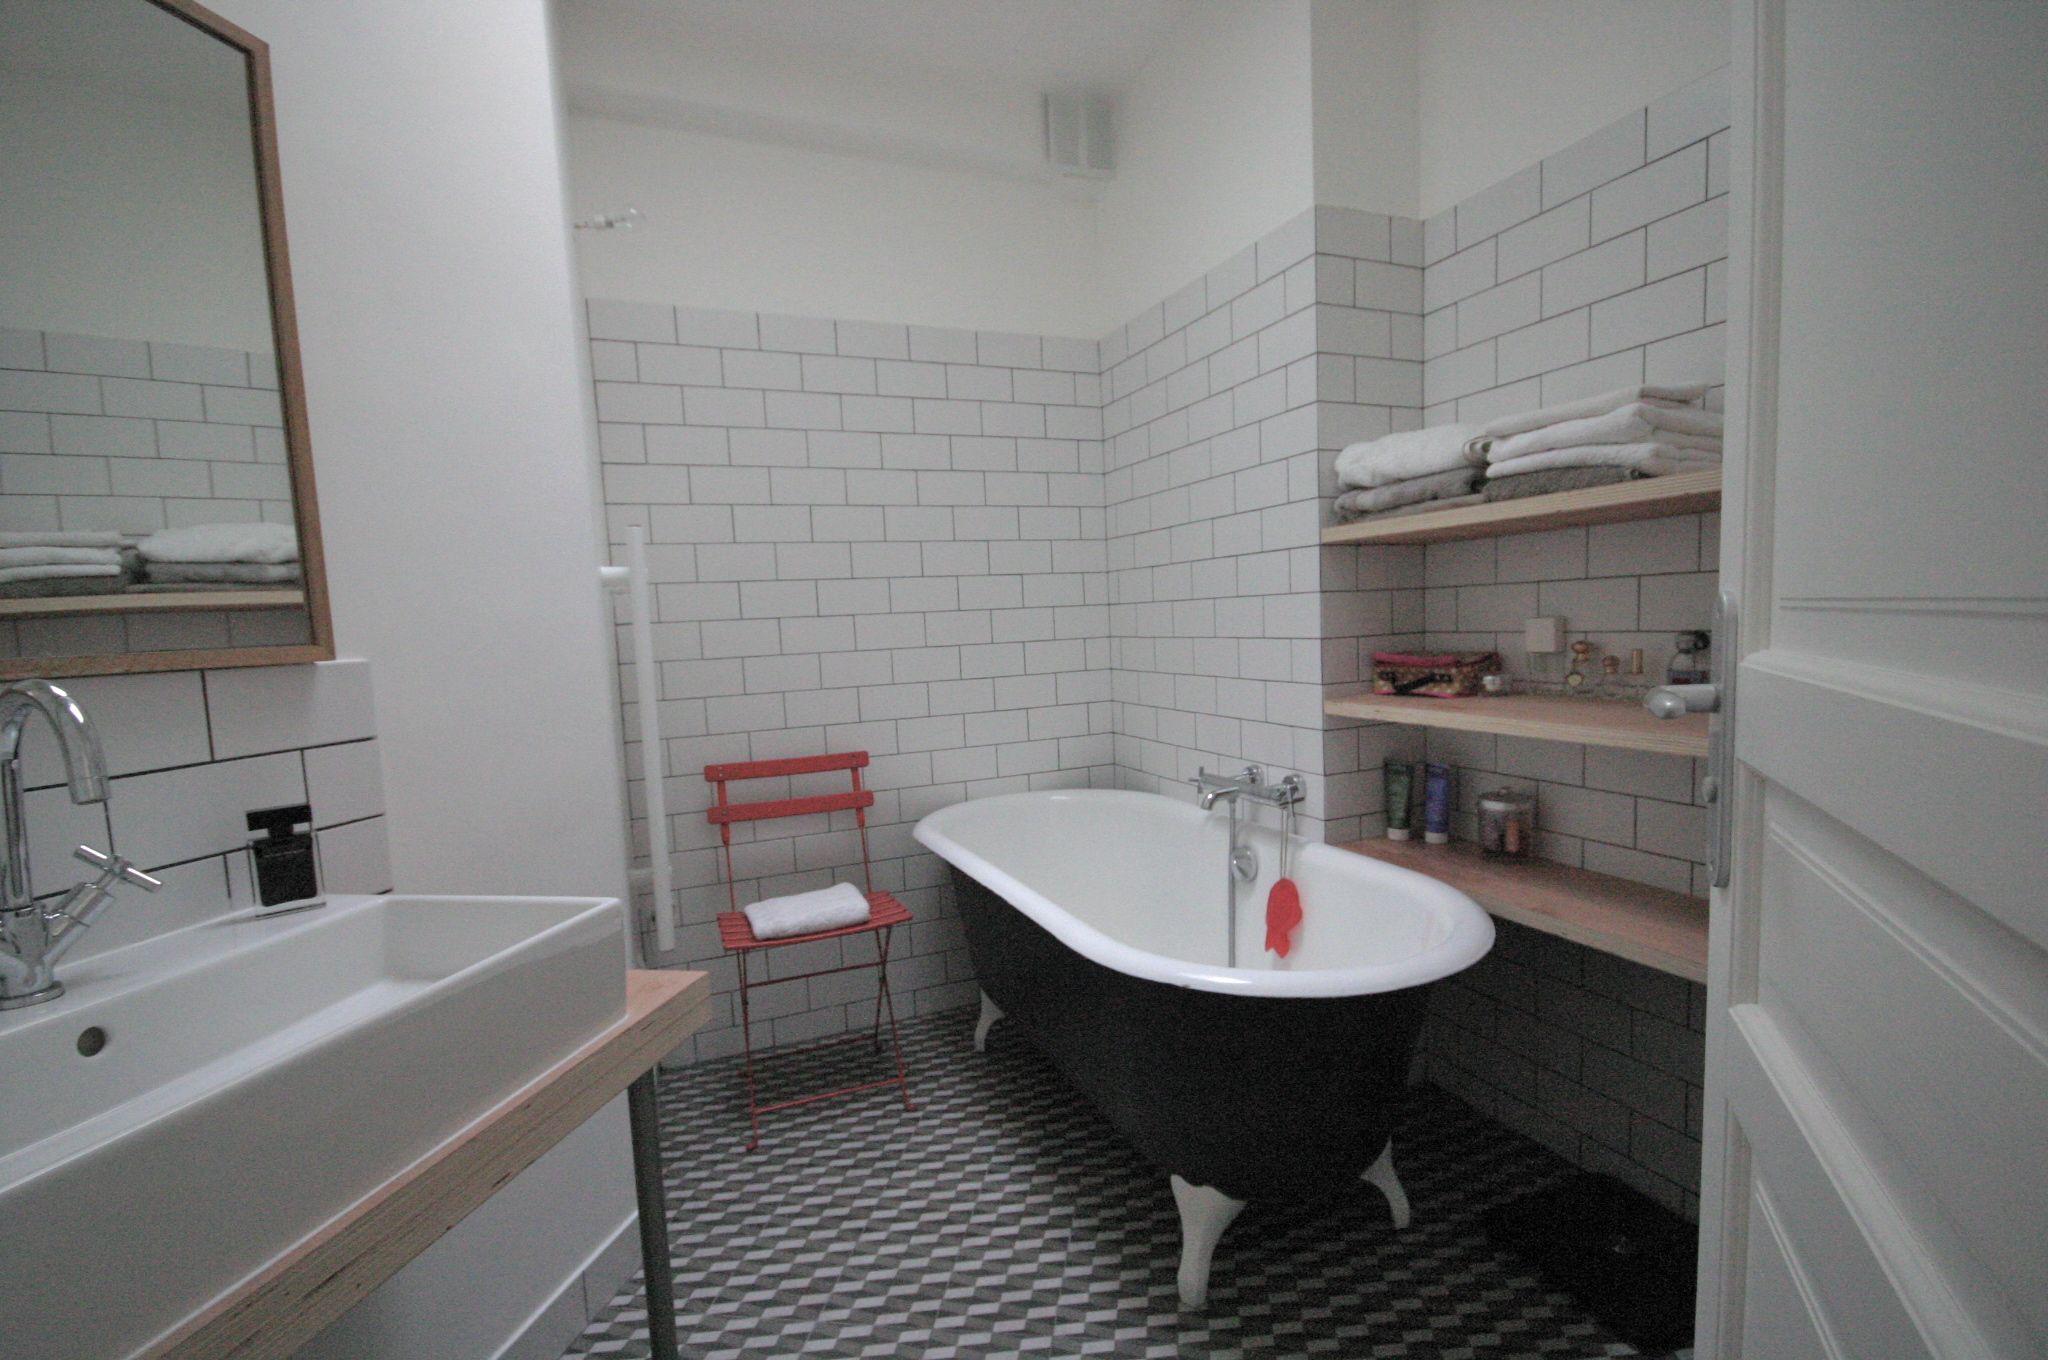 salle de bain r tro chic en gris et blanc carrelage mutina azulej fa ence m tro agence murs. Black Bedroom Furniture Sets. Home Design Ideas